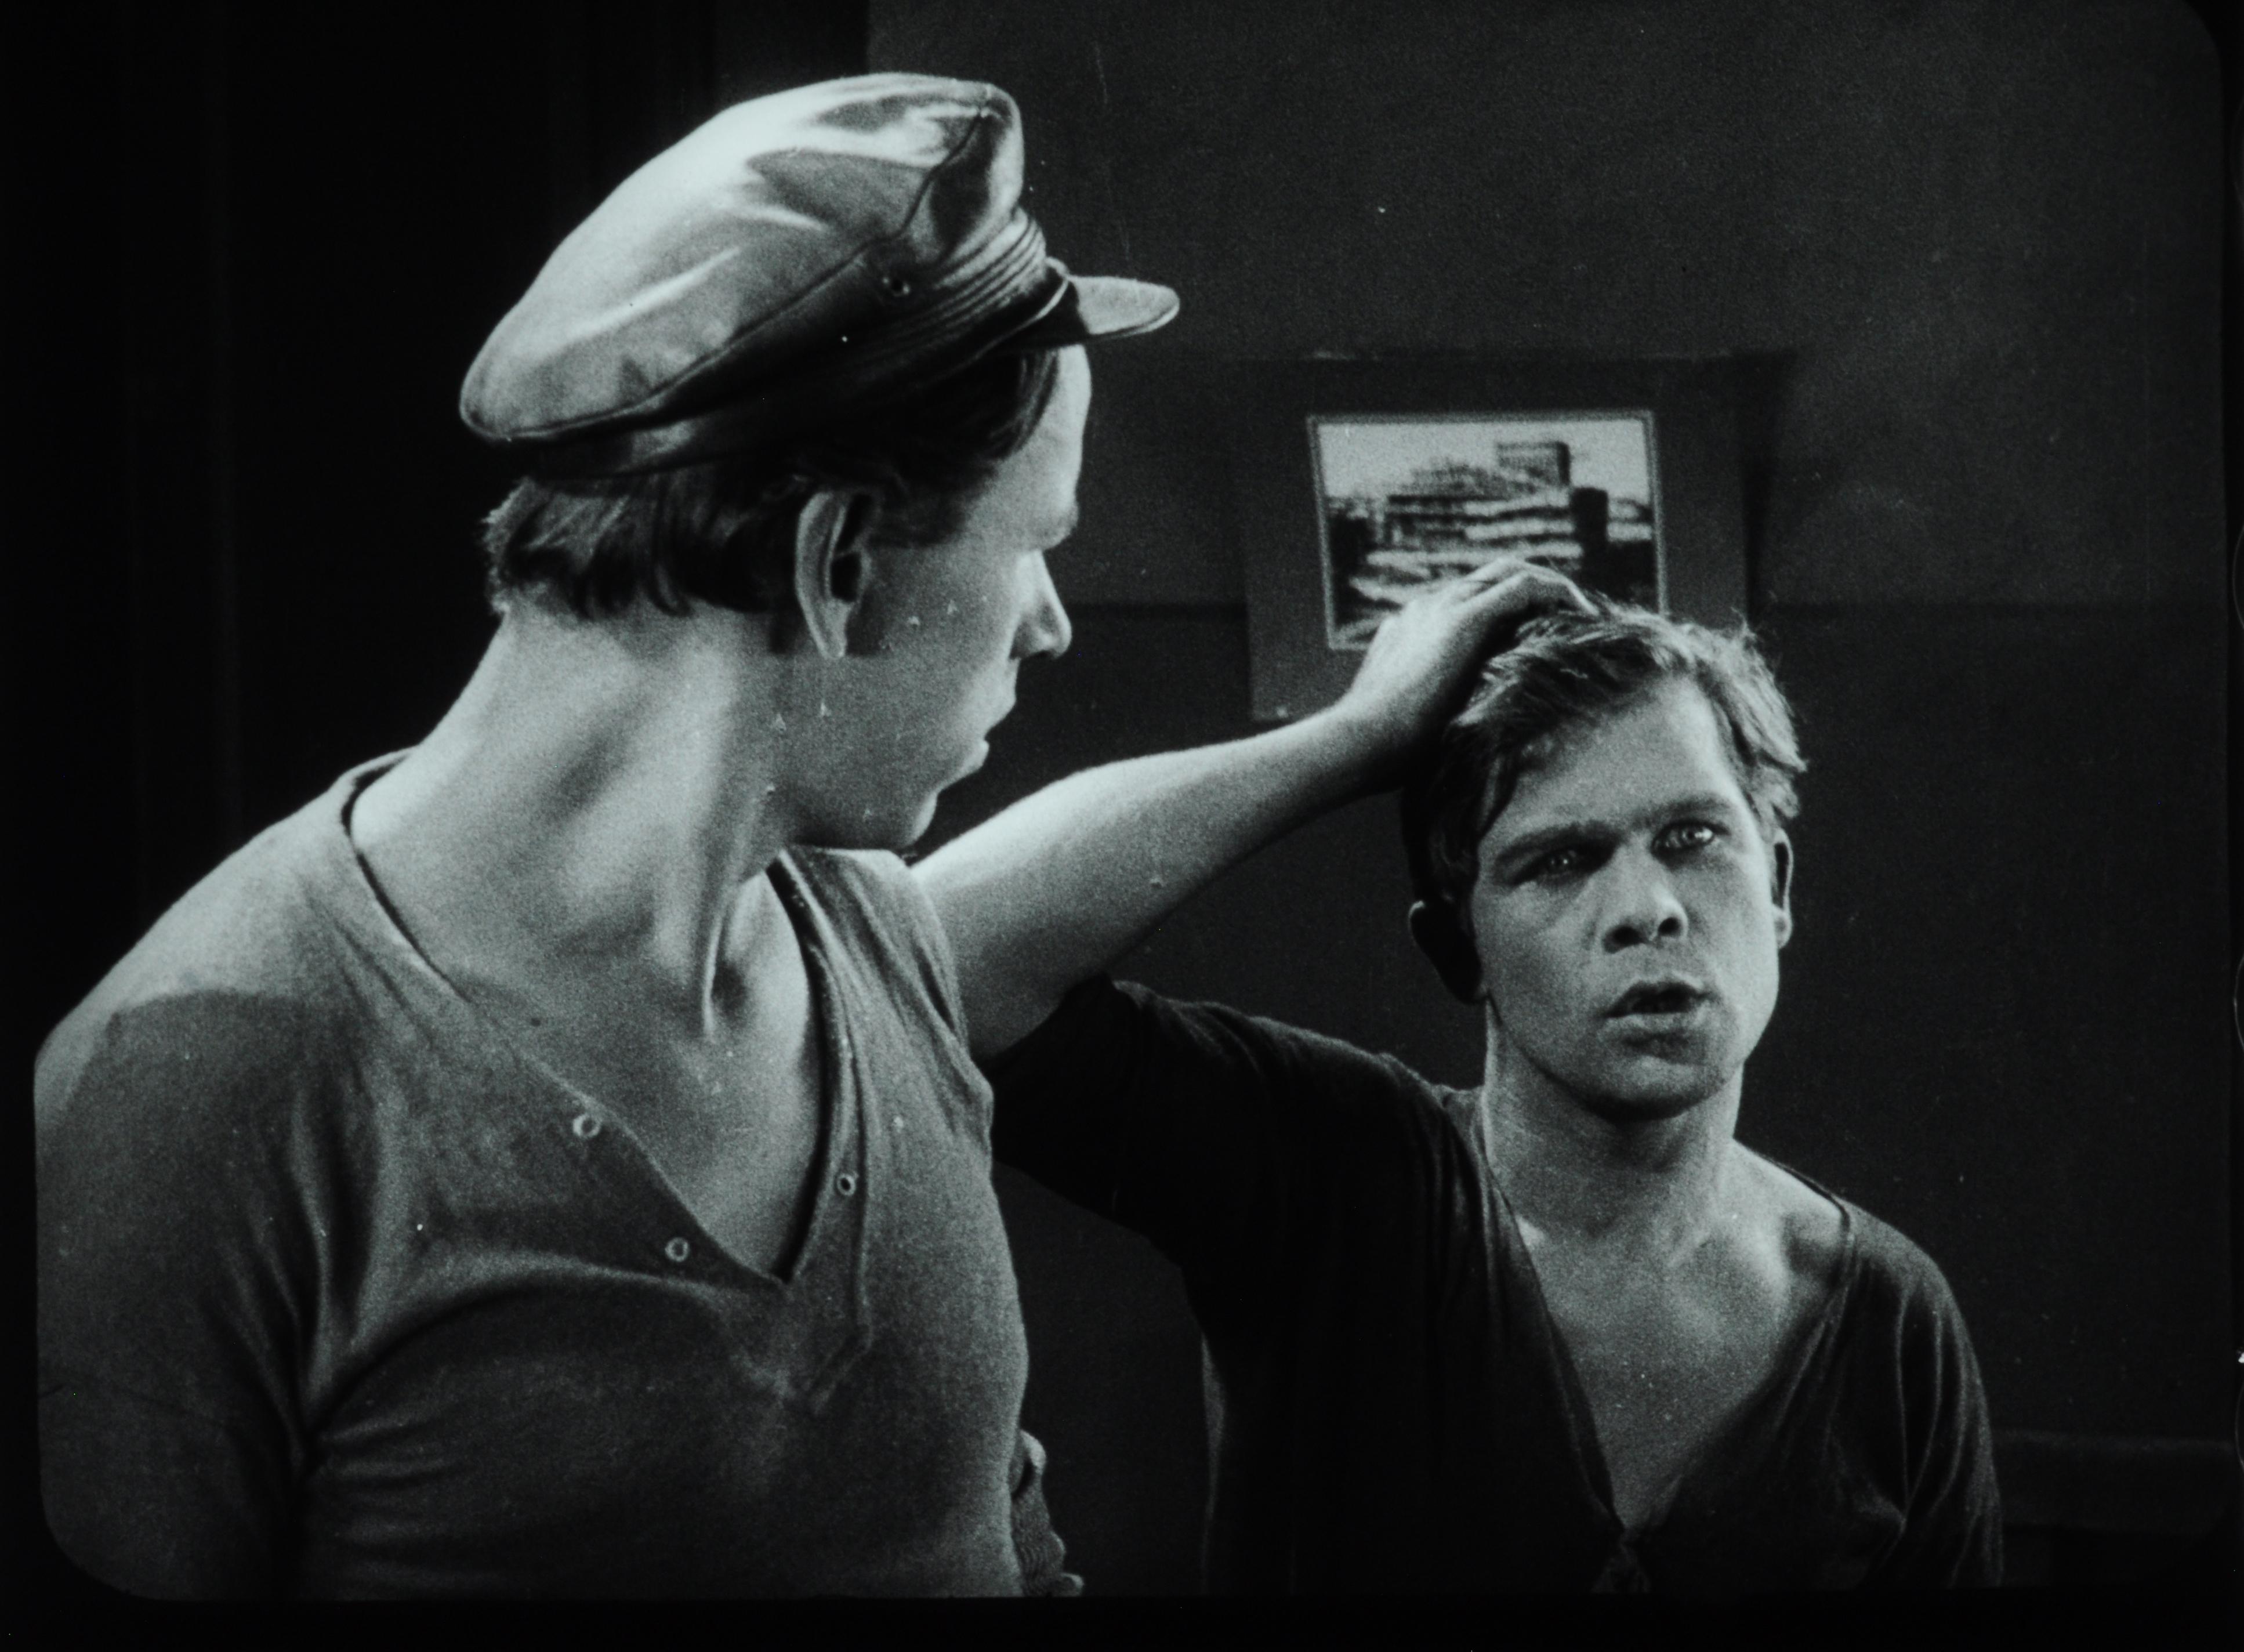 soviet cinema silent london dva druga model i podruga kanitel s mashinkoi neobychainye prikliucheniia akhova i makhova